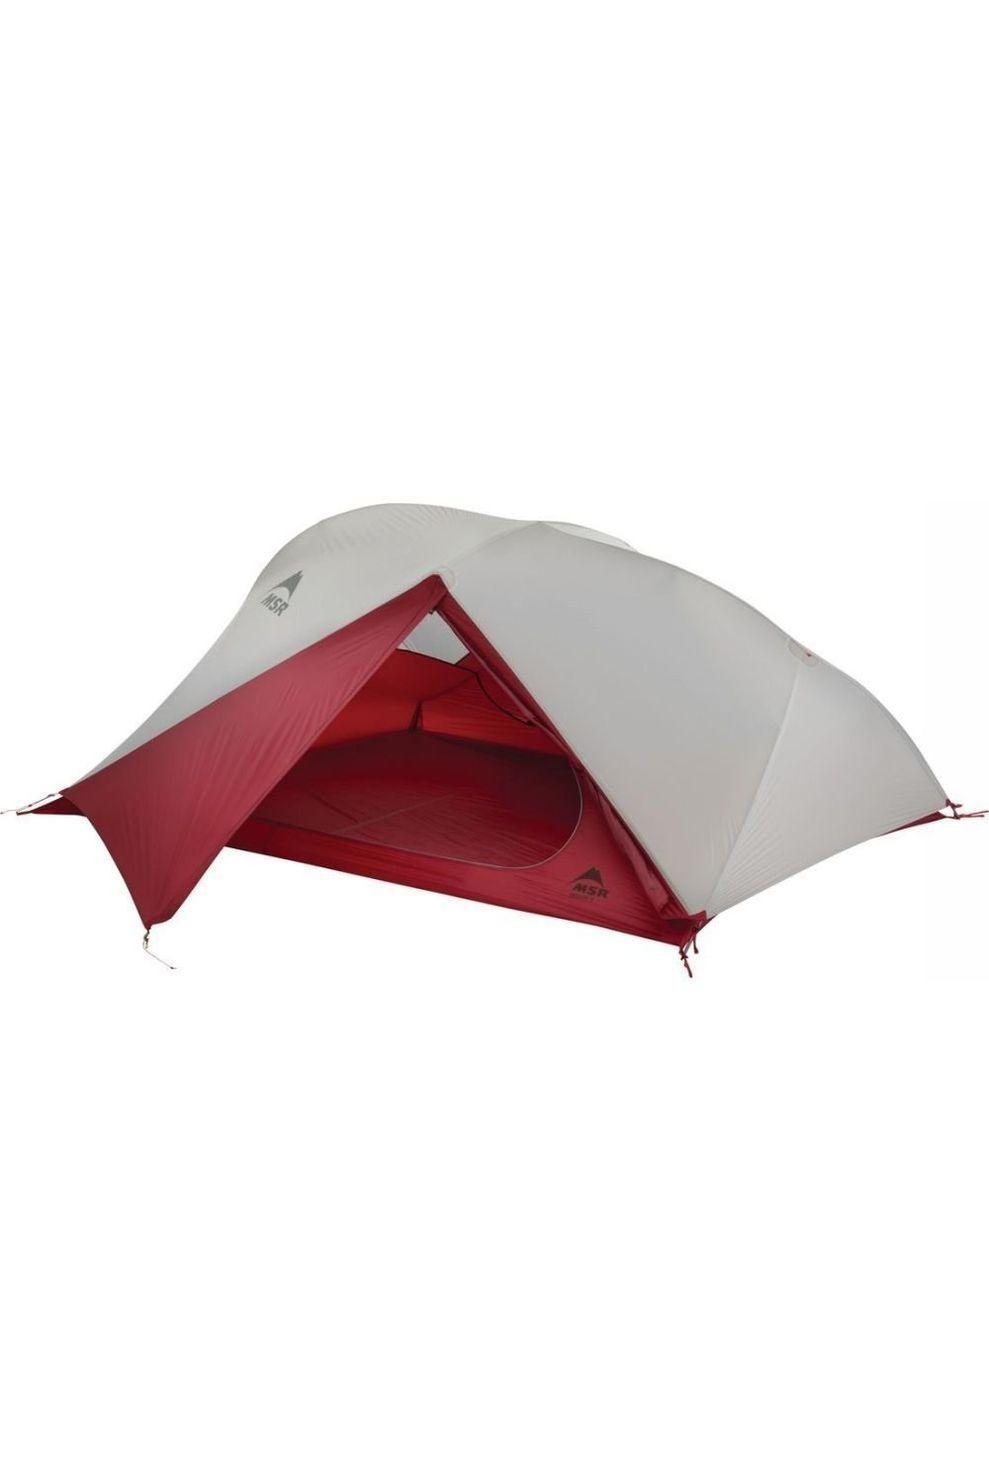 MSR Tent Freelite 3 V2 - Grijs